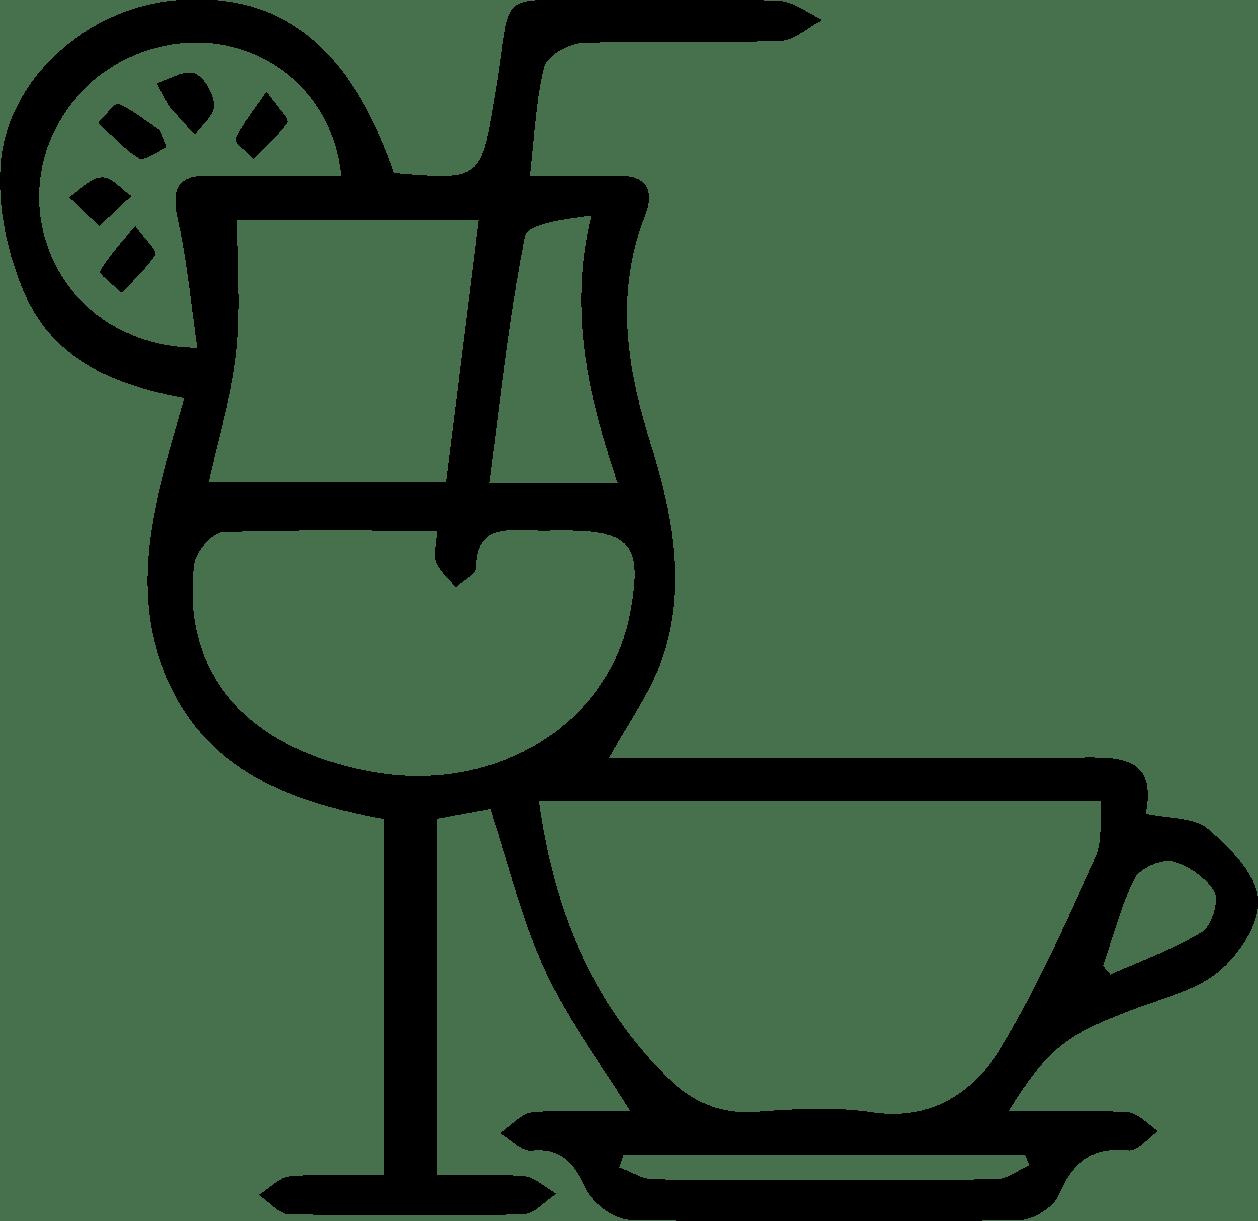 Trattino alimentation écologique